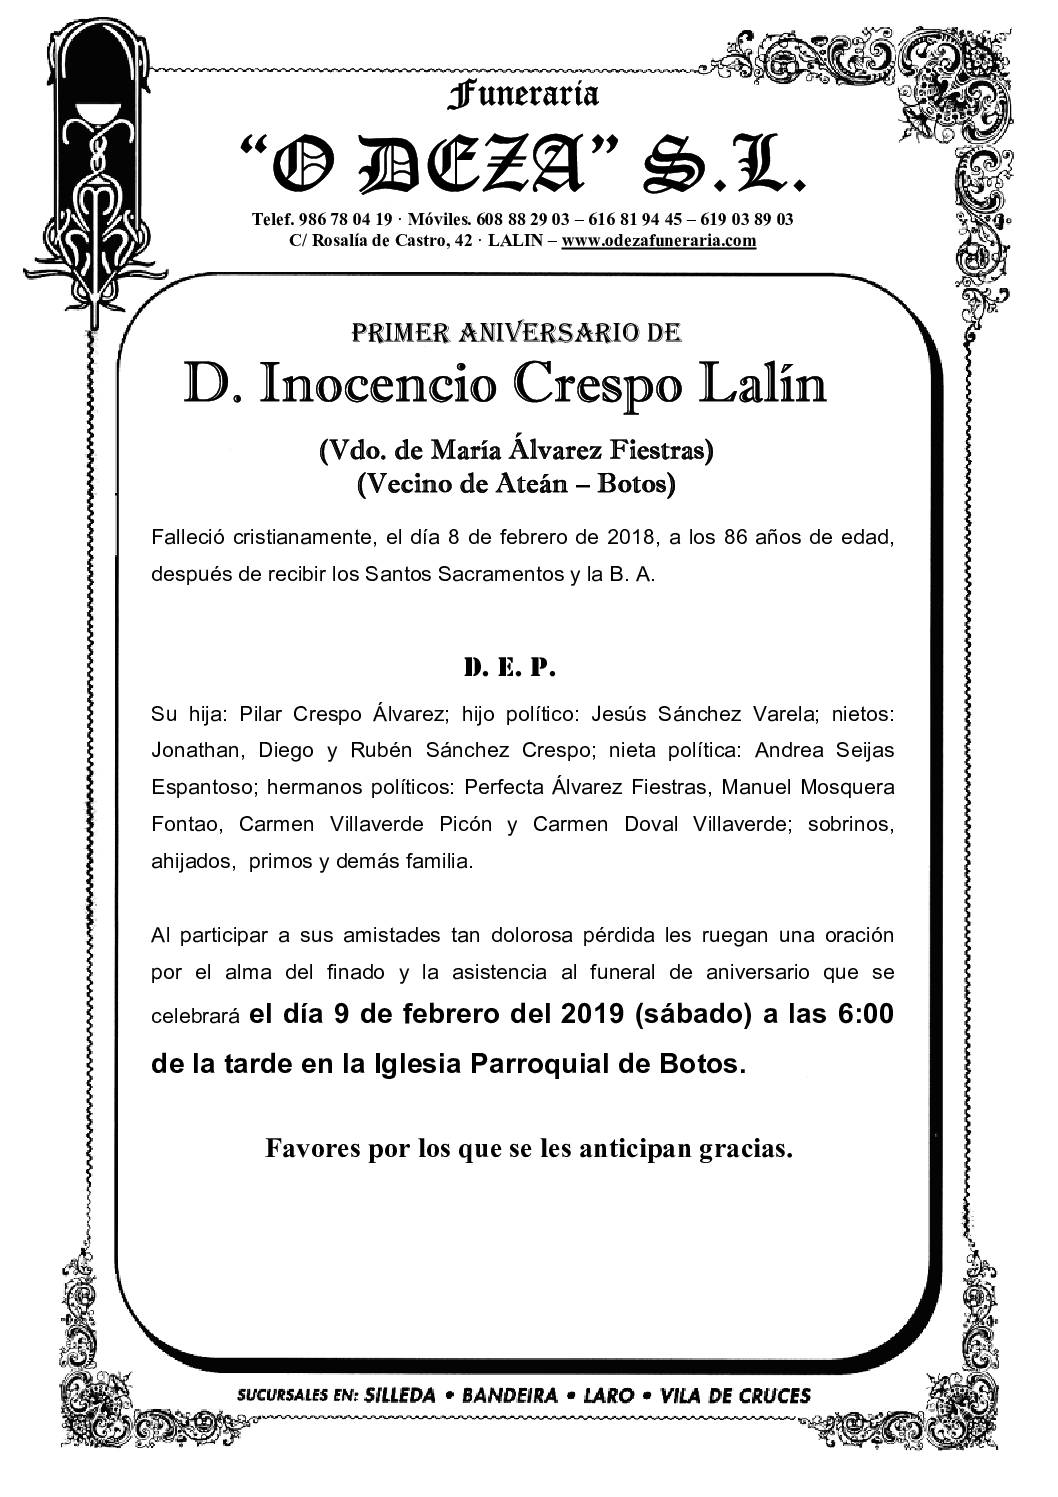 D. INOCENCIO CRESPO LALIN